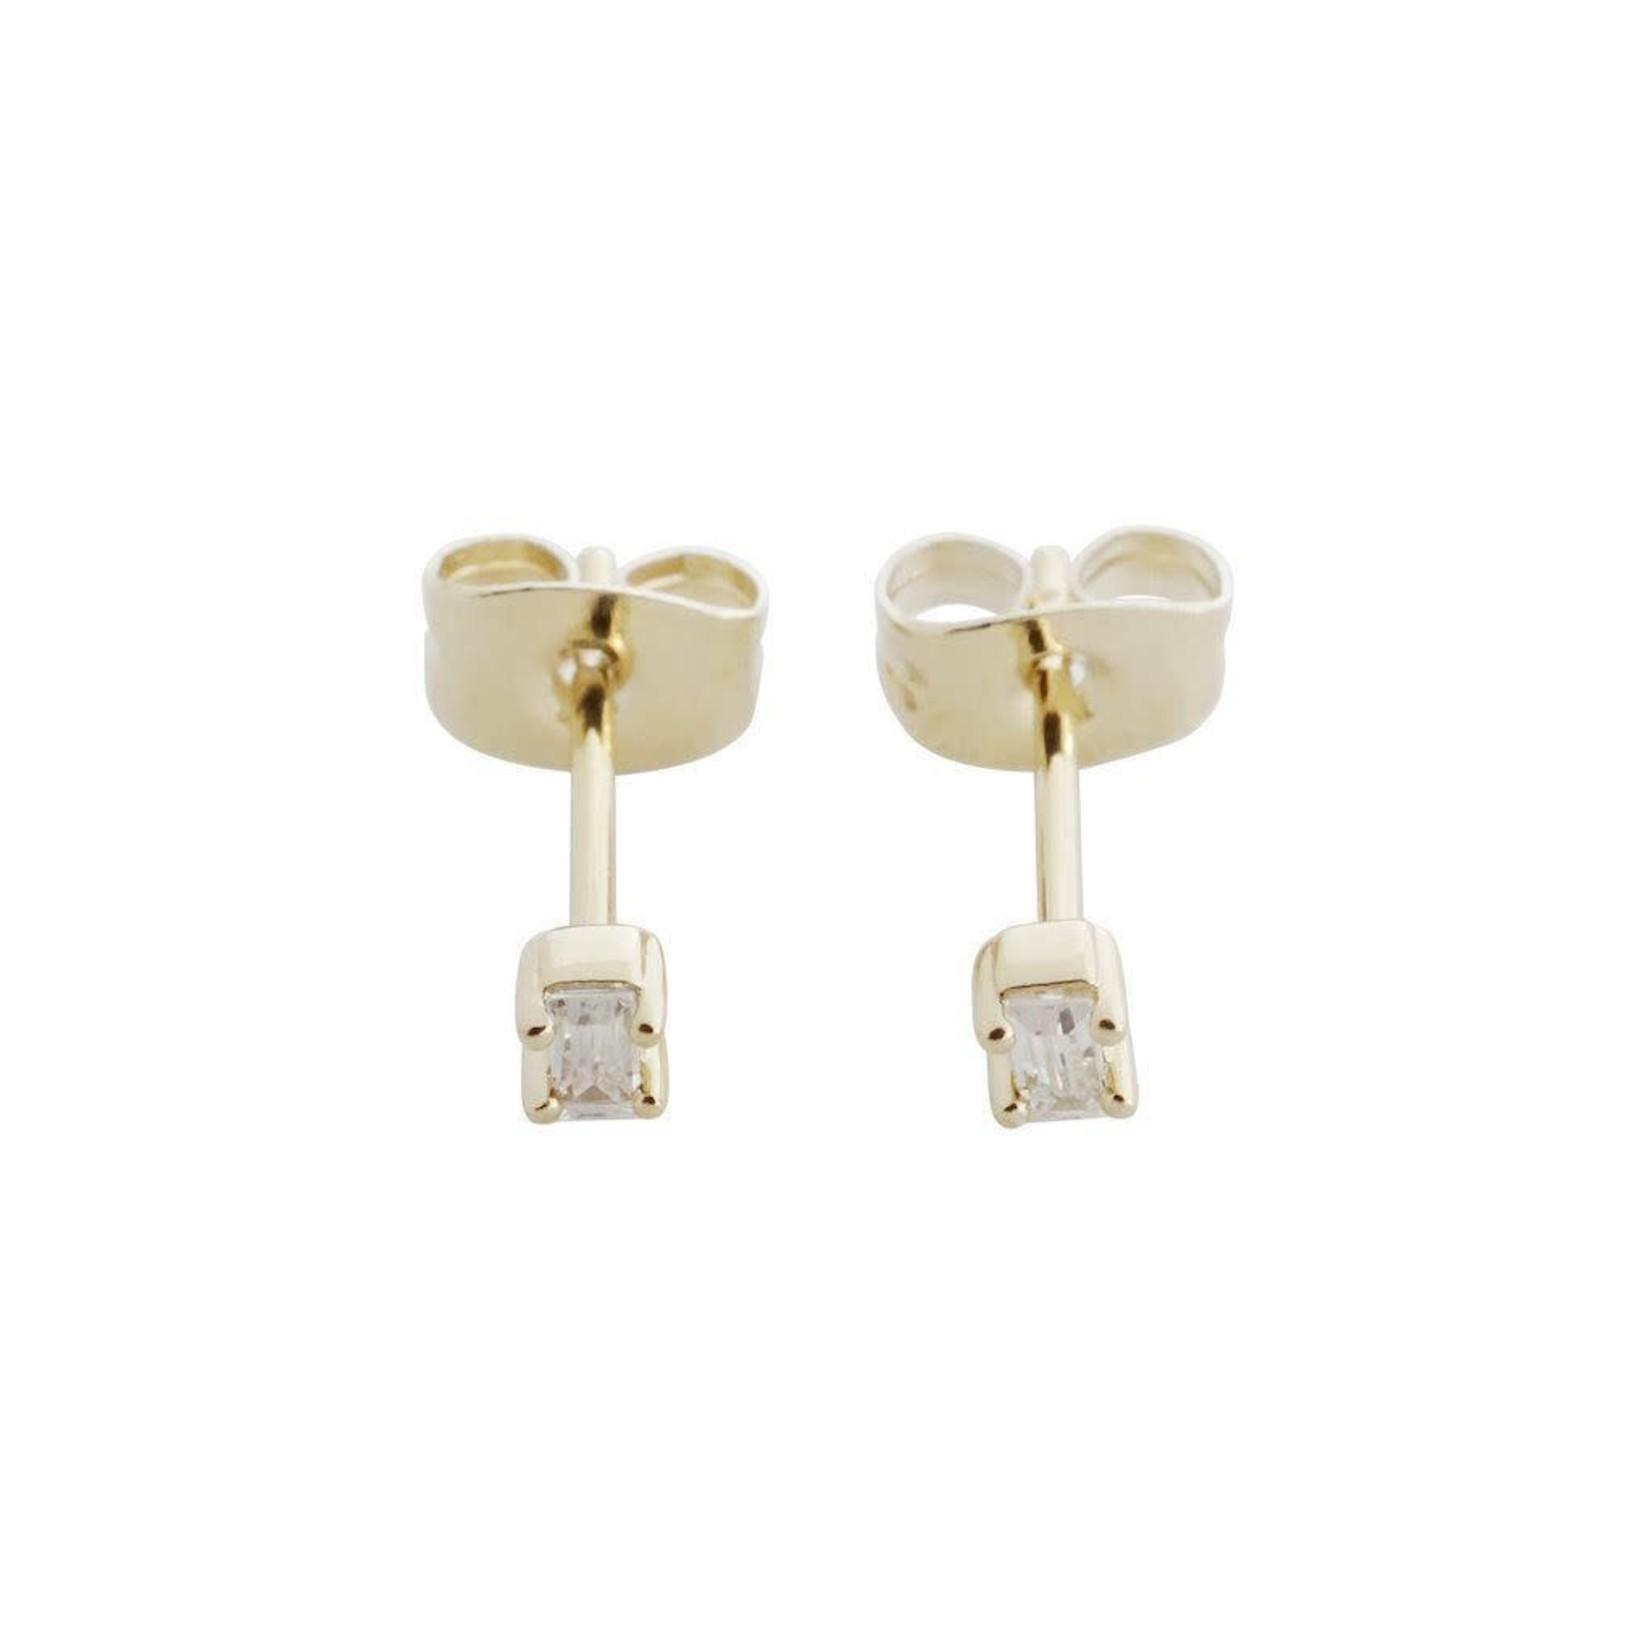 Honeycat Jewelry Honeycat Crystal Baguette Studs Earrings